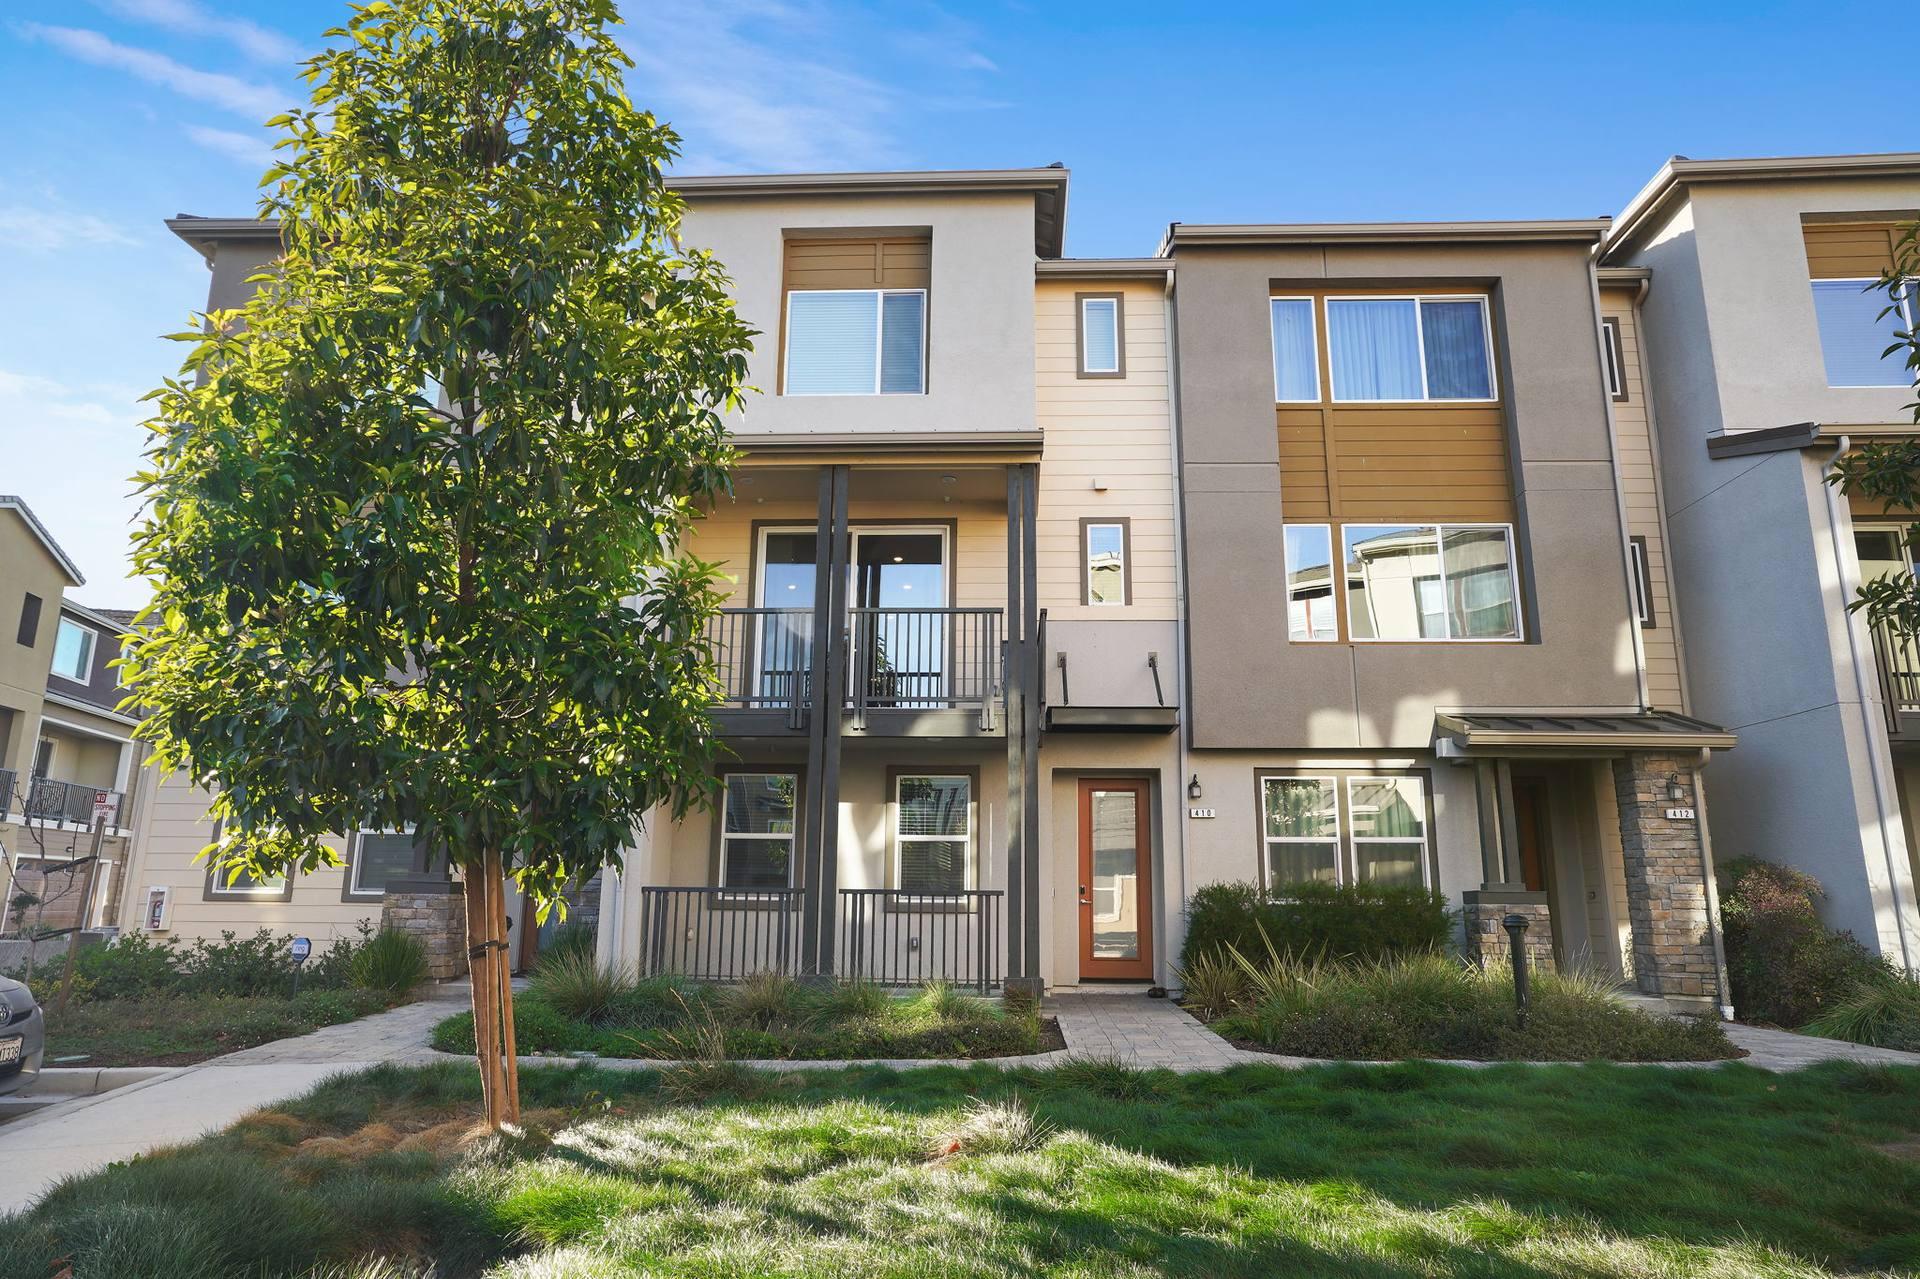 410 Desert Holly St, Milpitas, CA 95035, US